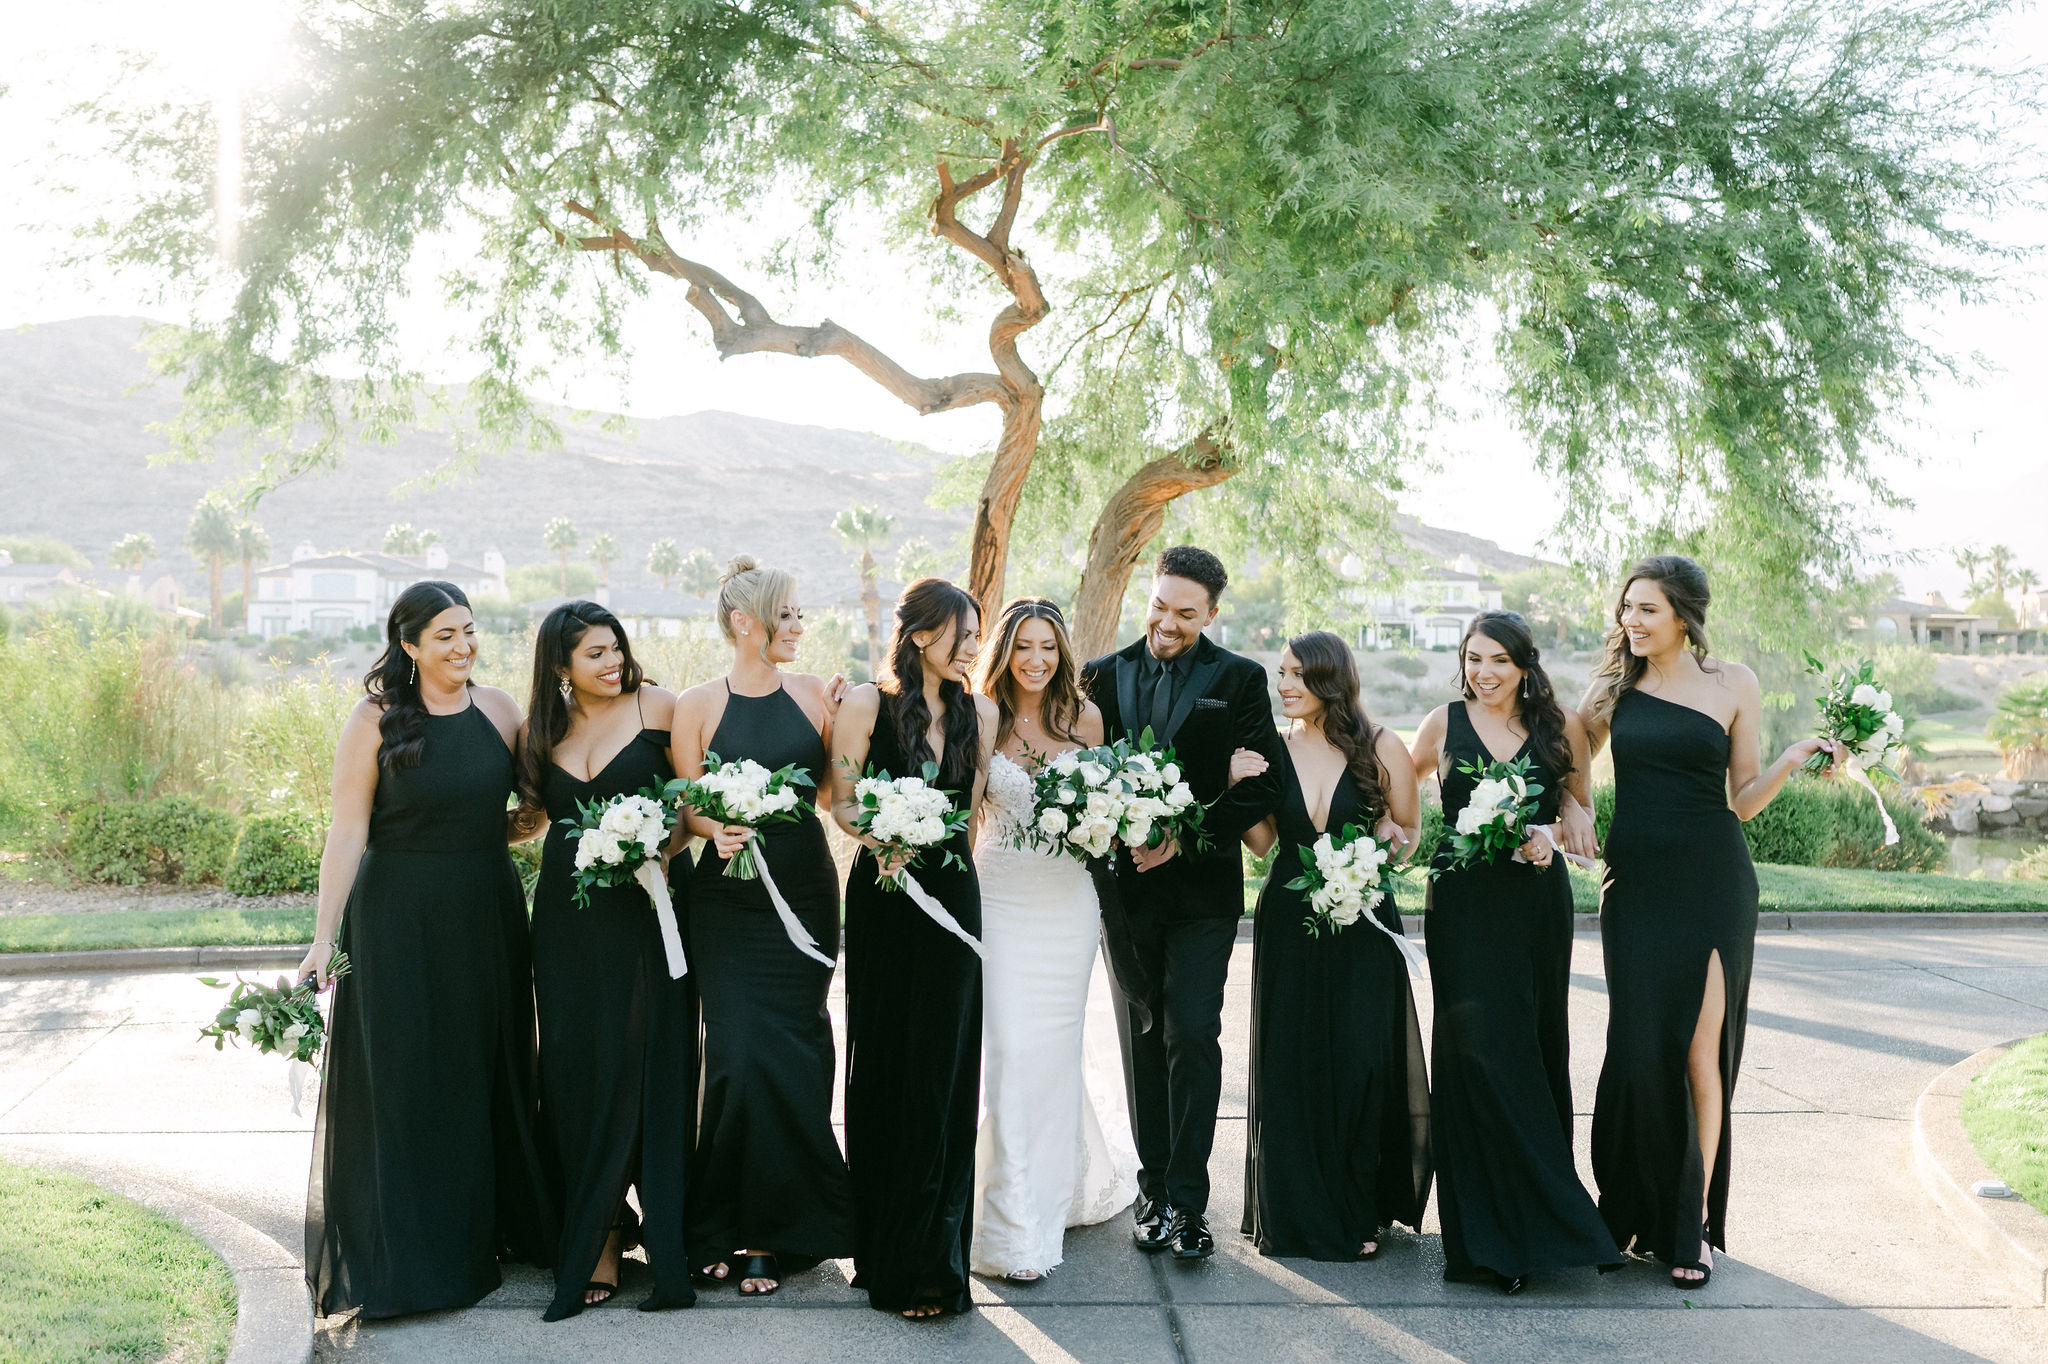 Casey-and-Tyler-Wedding-Teaser-16